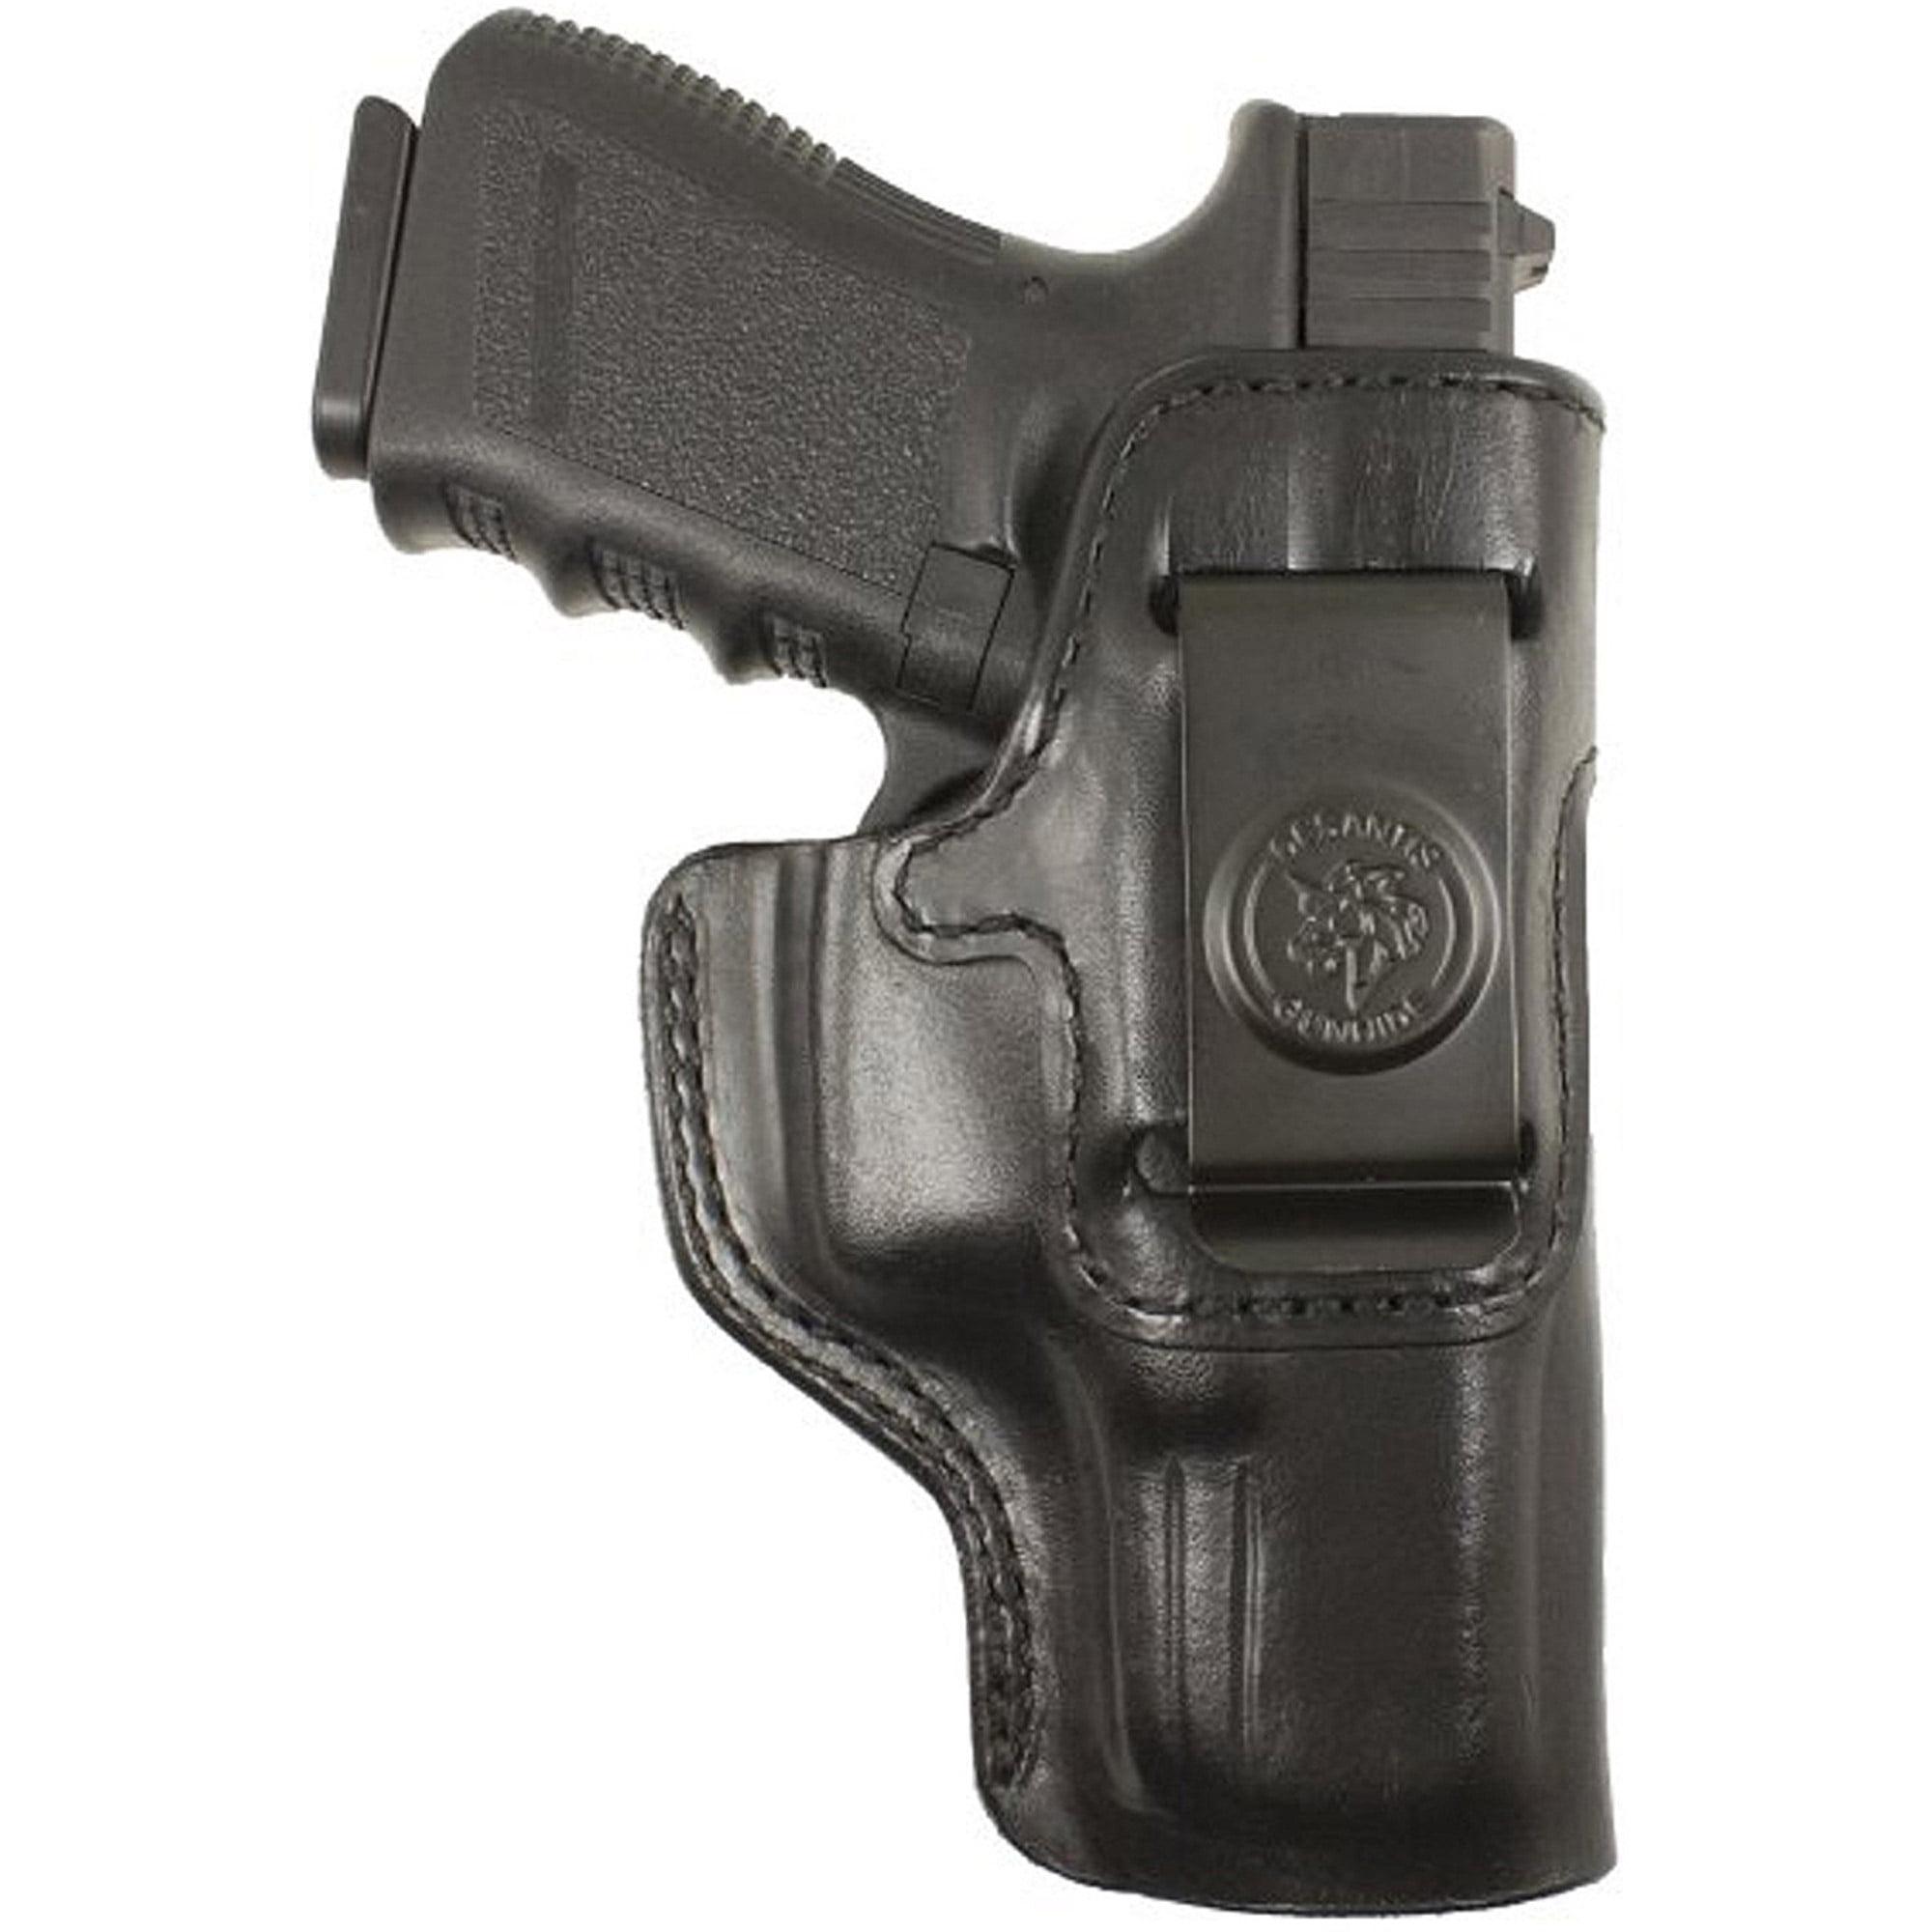 DeSantis Inside Heat Holder for Glock 43, Right Hand, Black by Desantis